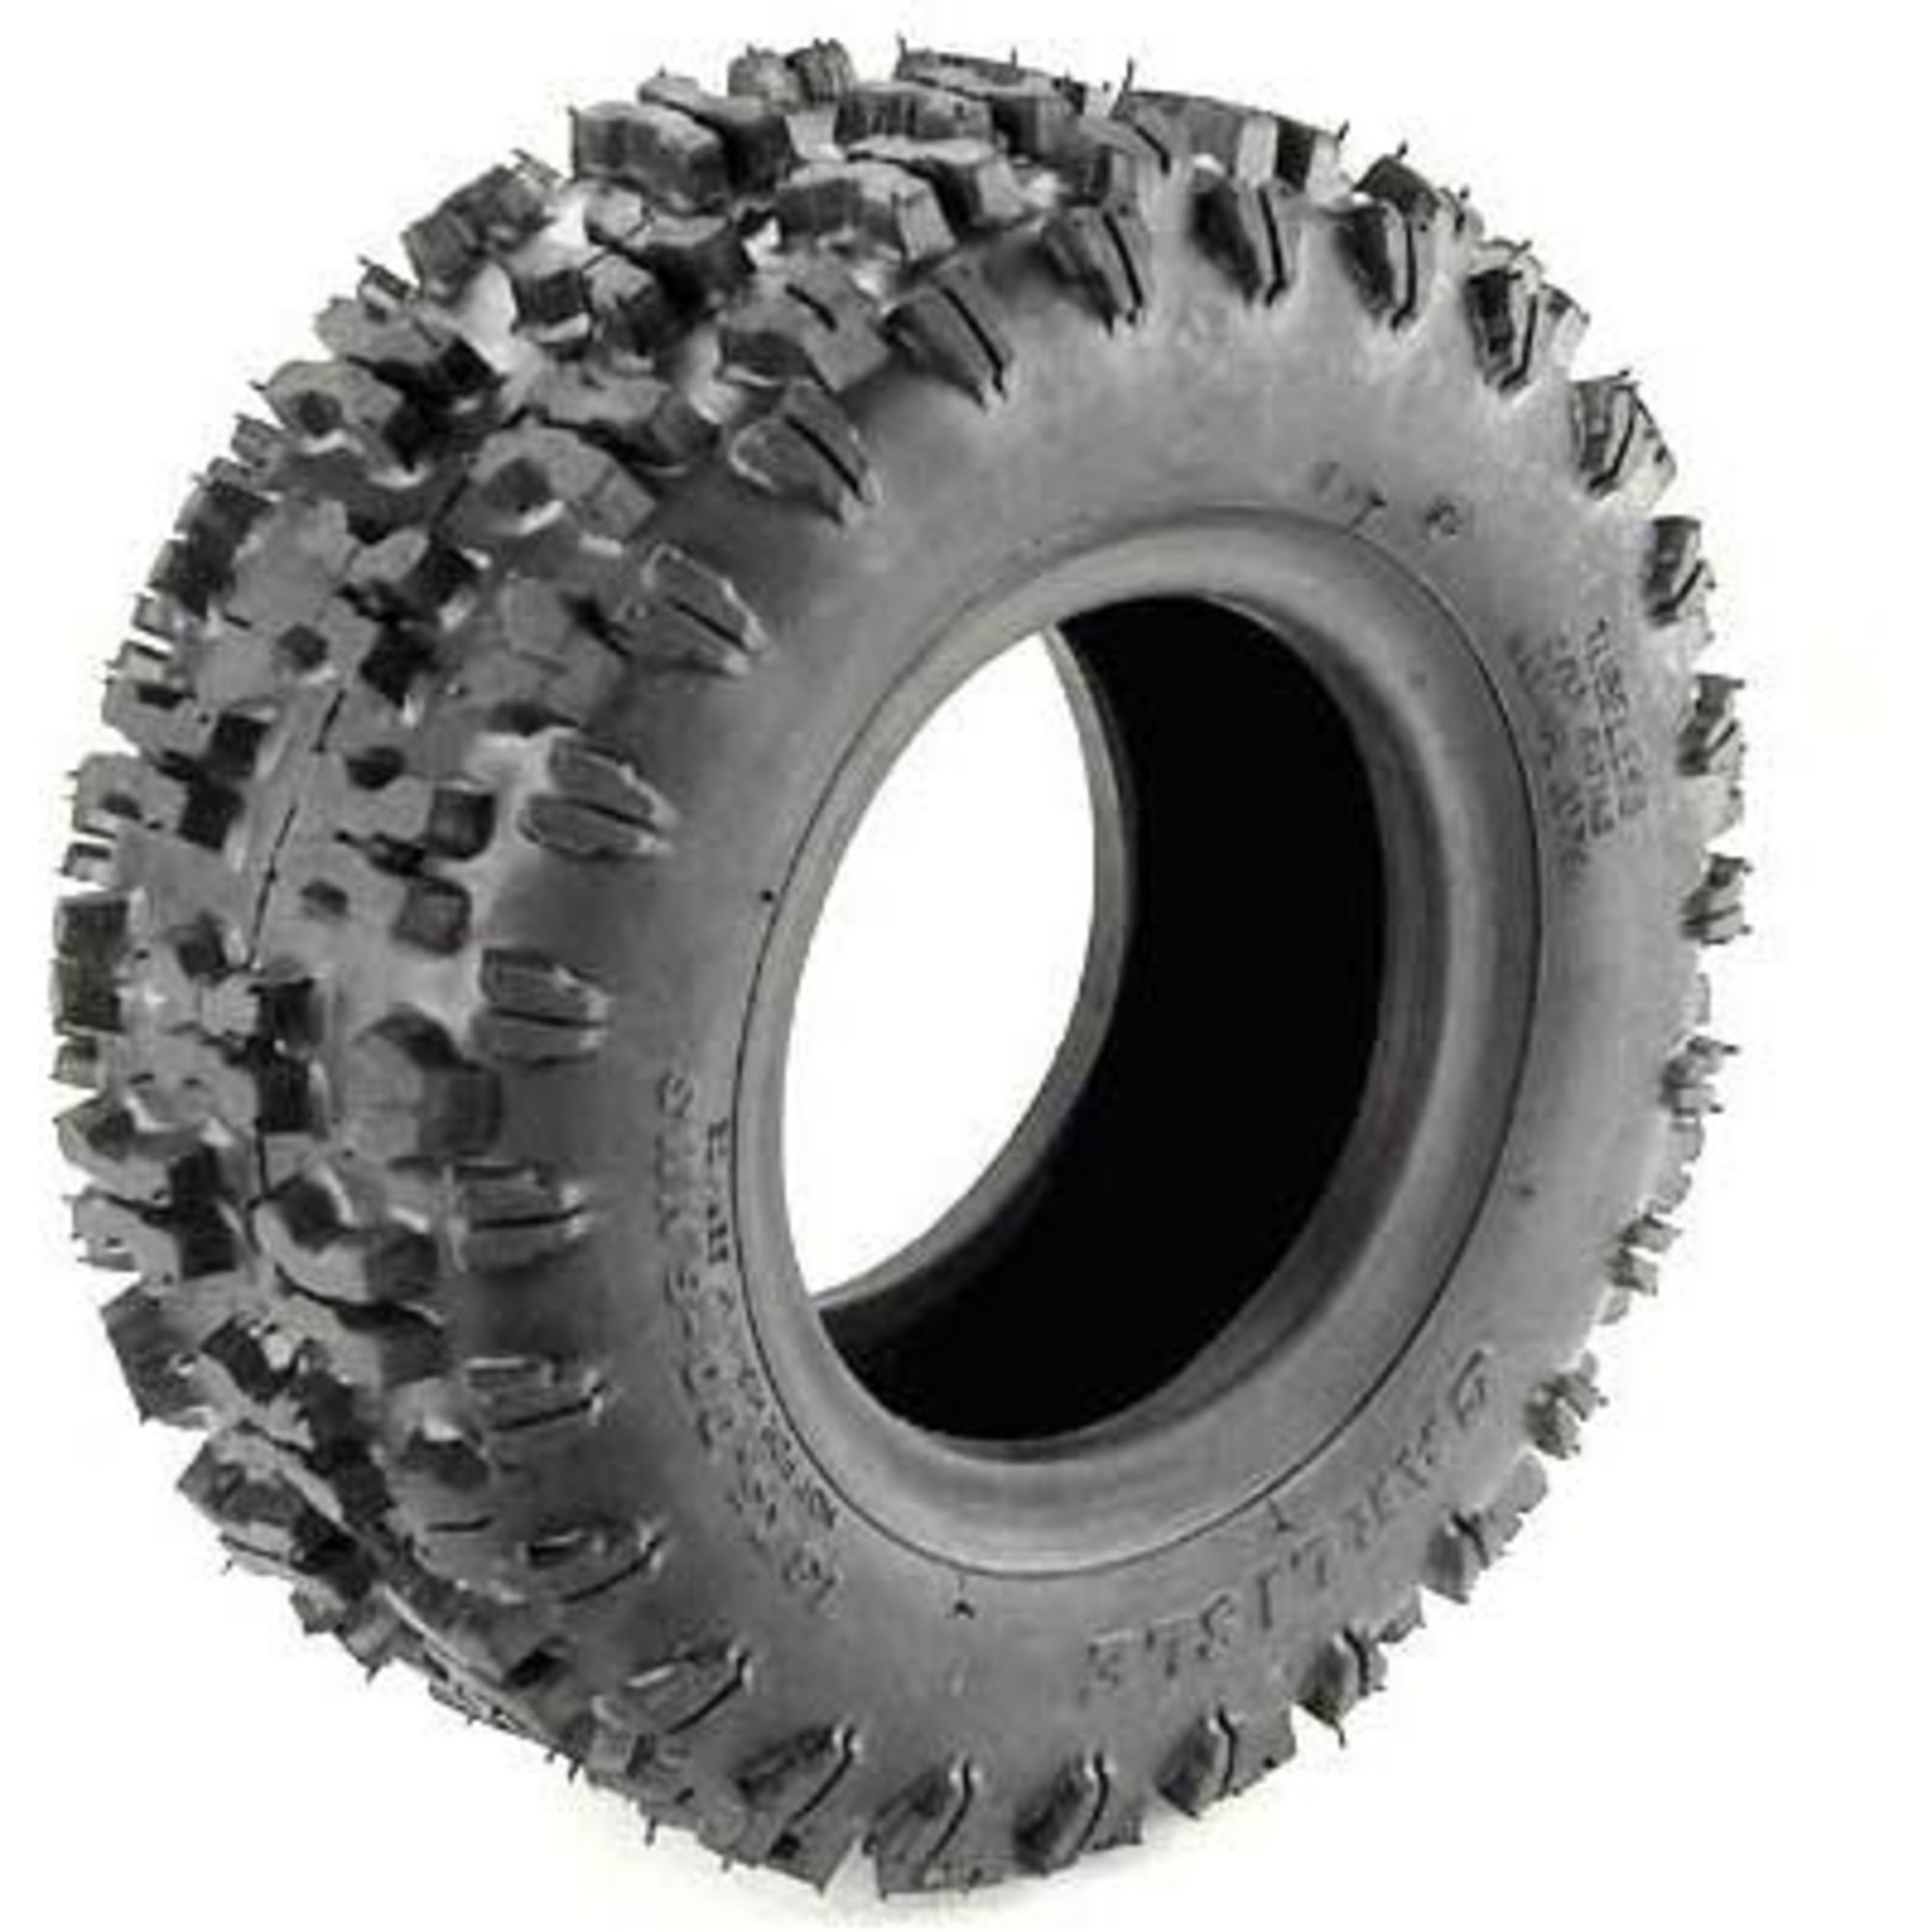 carlisle snow hog tire 2 ply. Black Bedroom Furniture Sets. Home Design Ideas